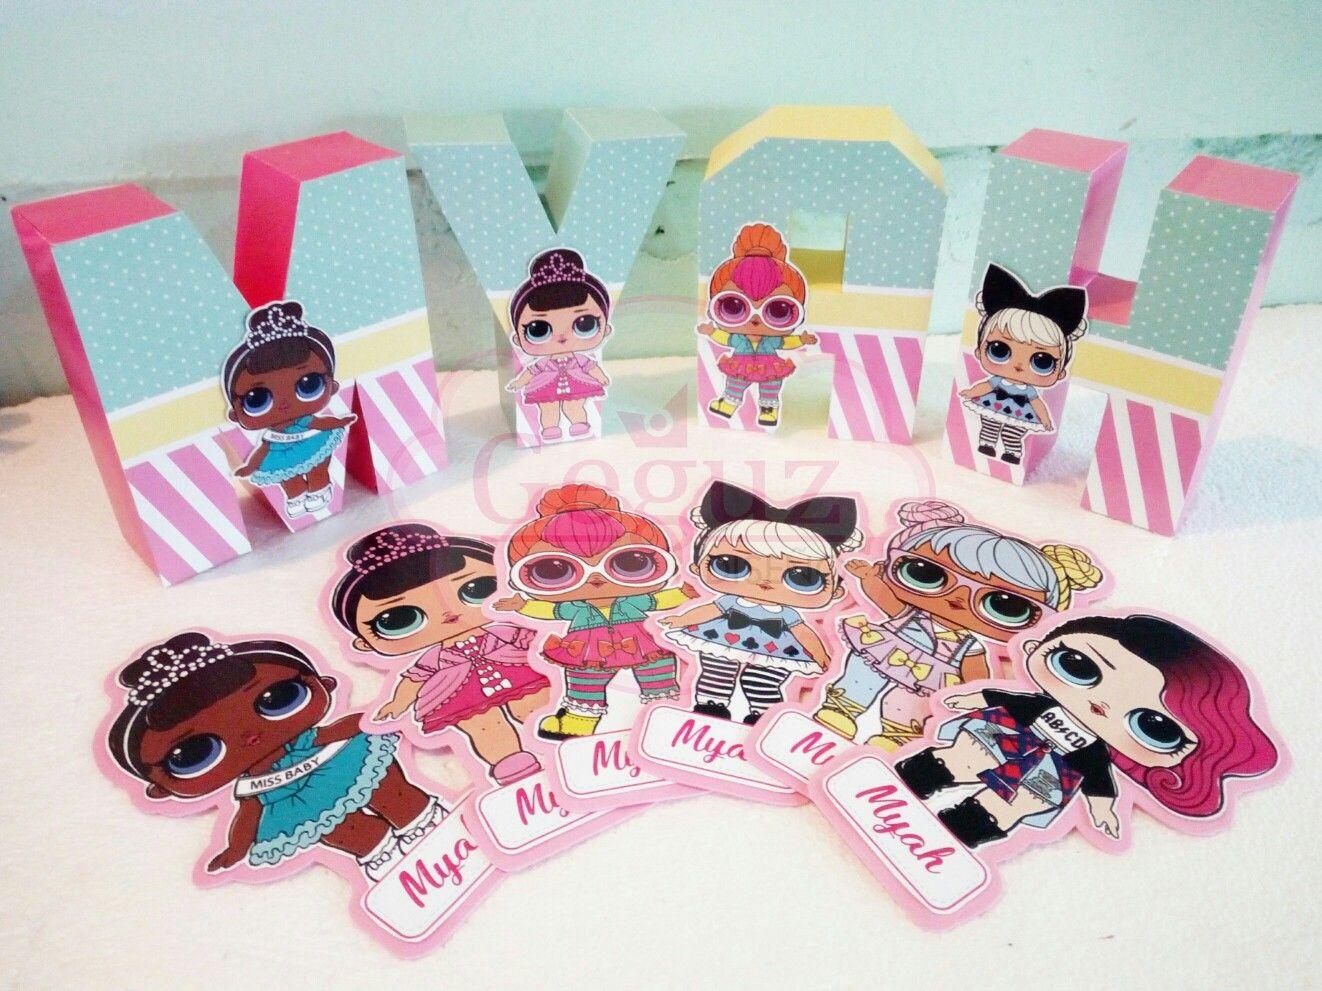 Lol Surprise Birthday Decor Candy Bar Bag Box Toppers Sticker Banner Garland Souvenir Favors 3d Letters Centerpiece Lol Dolls Doll Party Lol